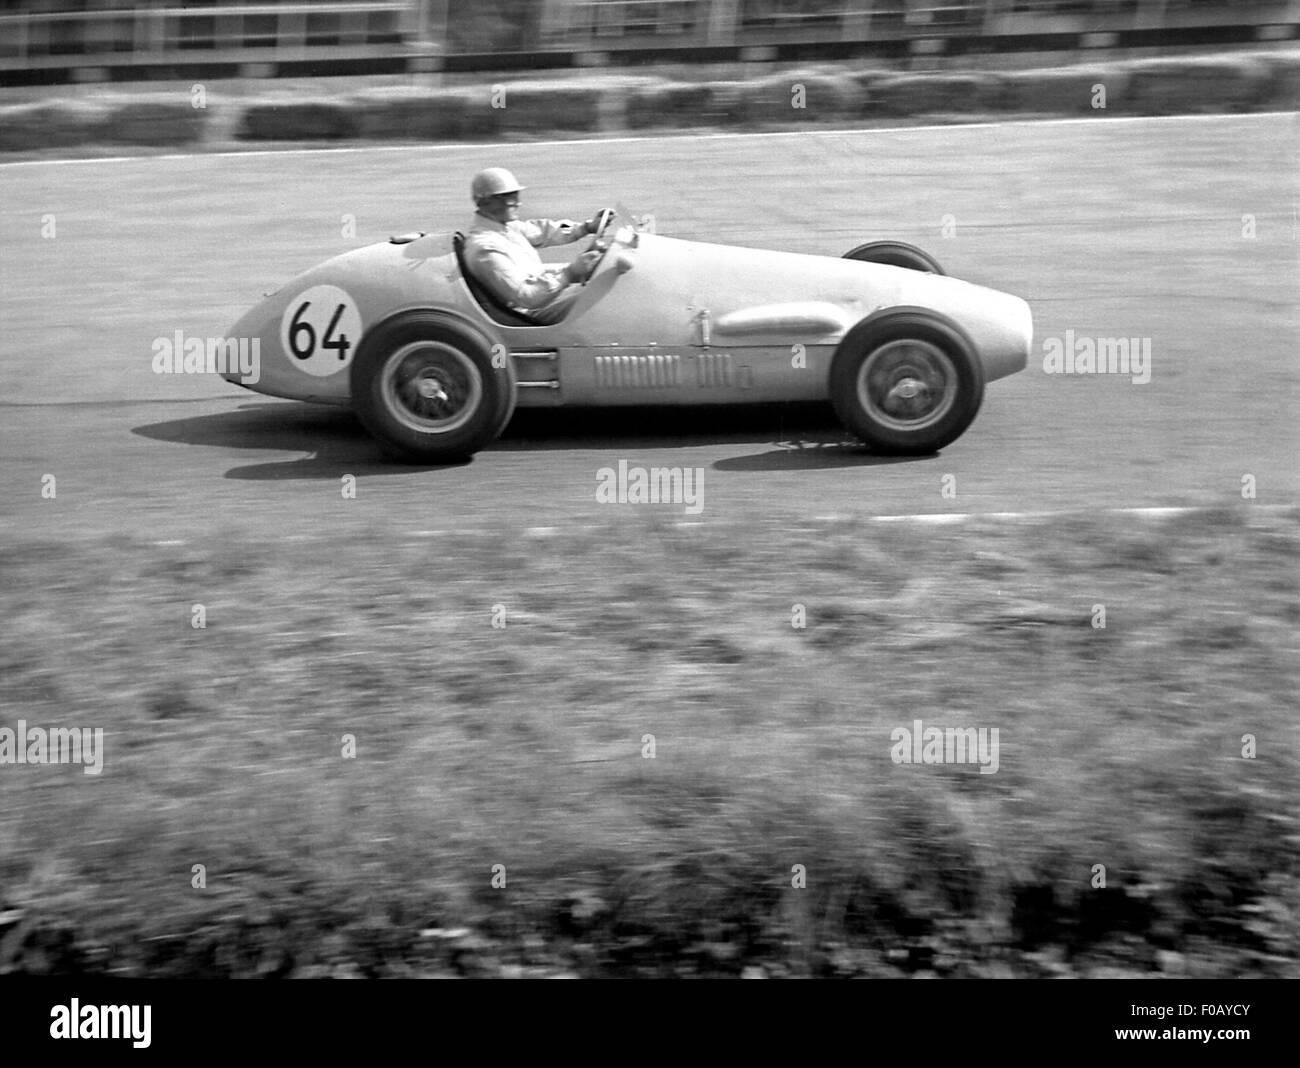 Ferrari racing car 1954 - Stock Image